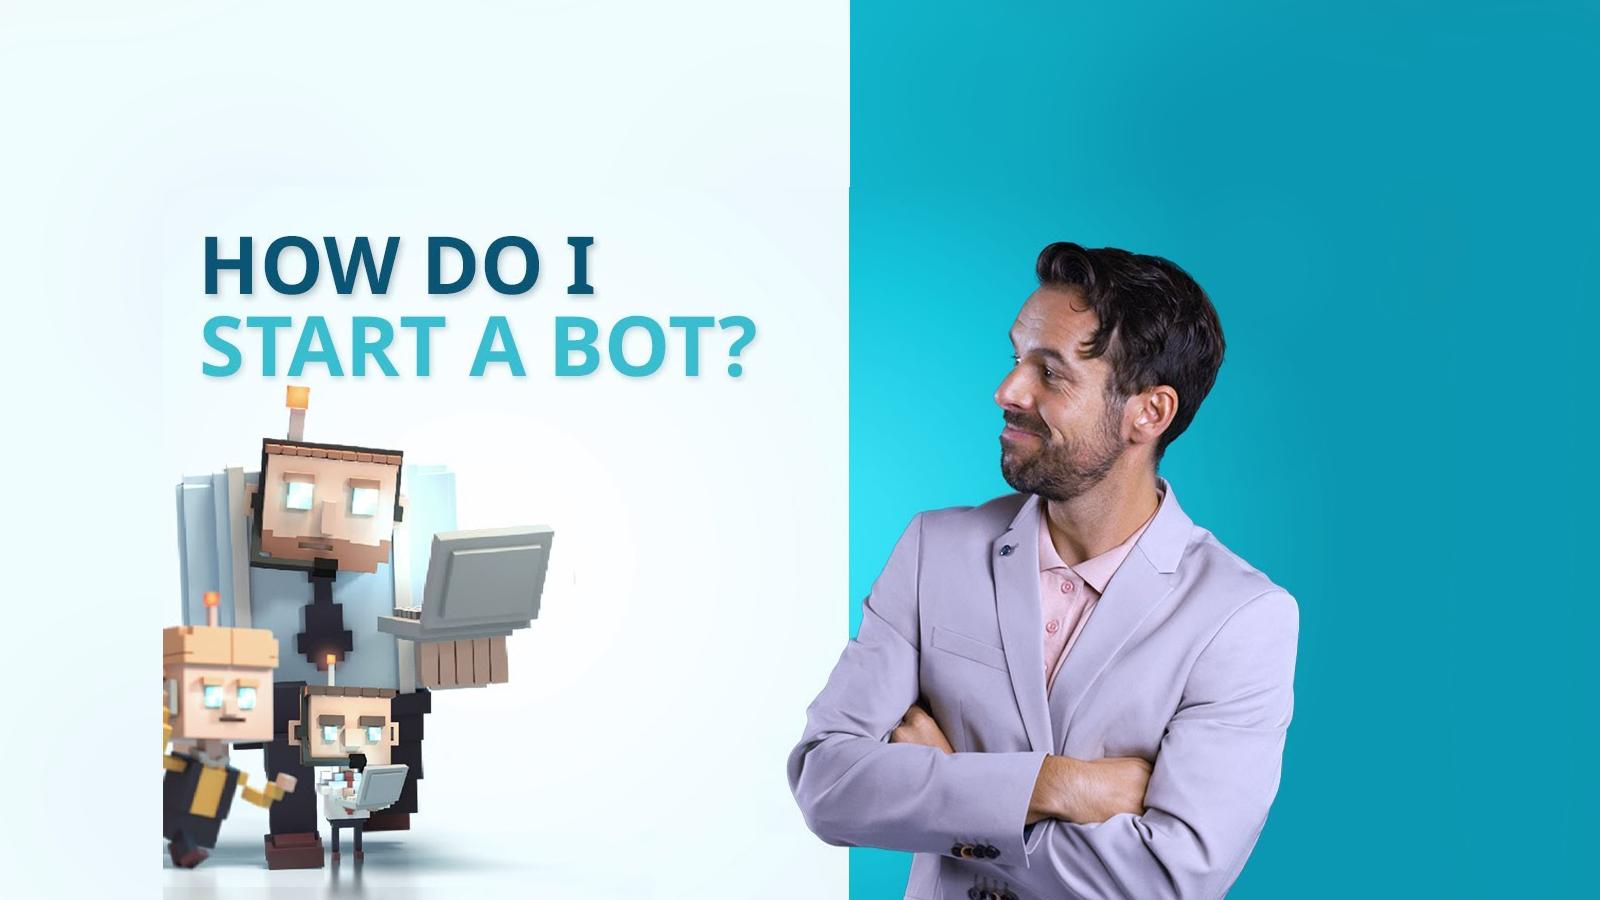 How do I start a bot within the BOTSapp?